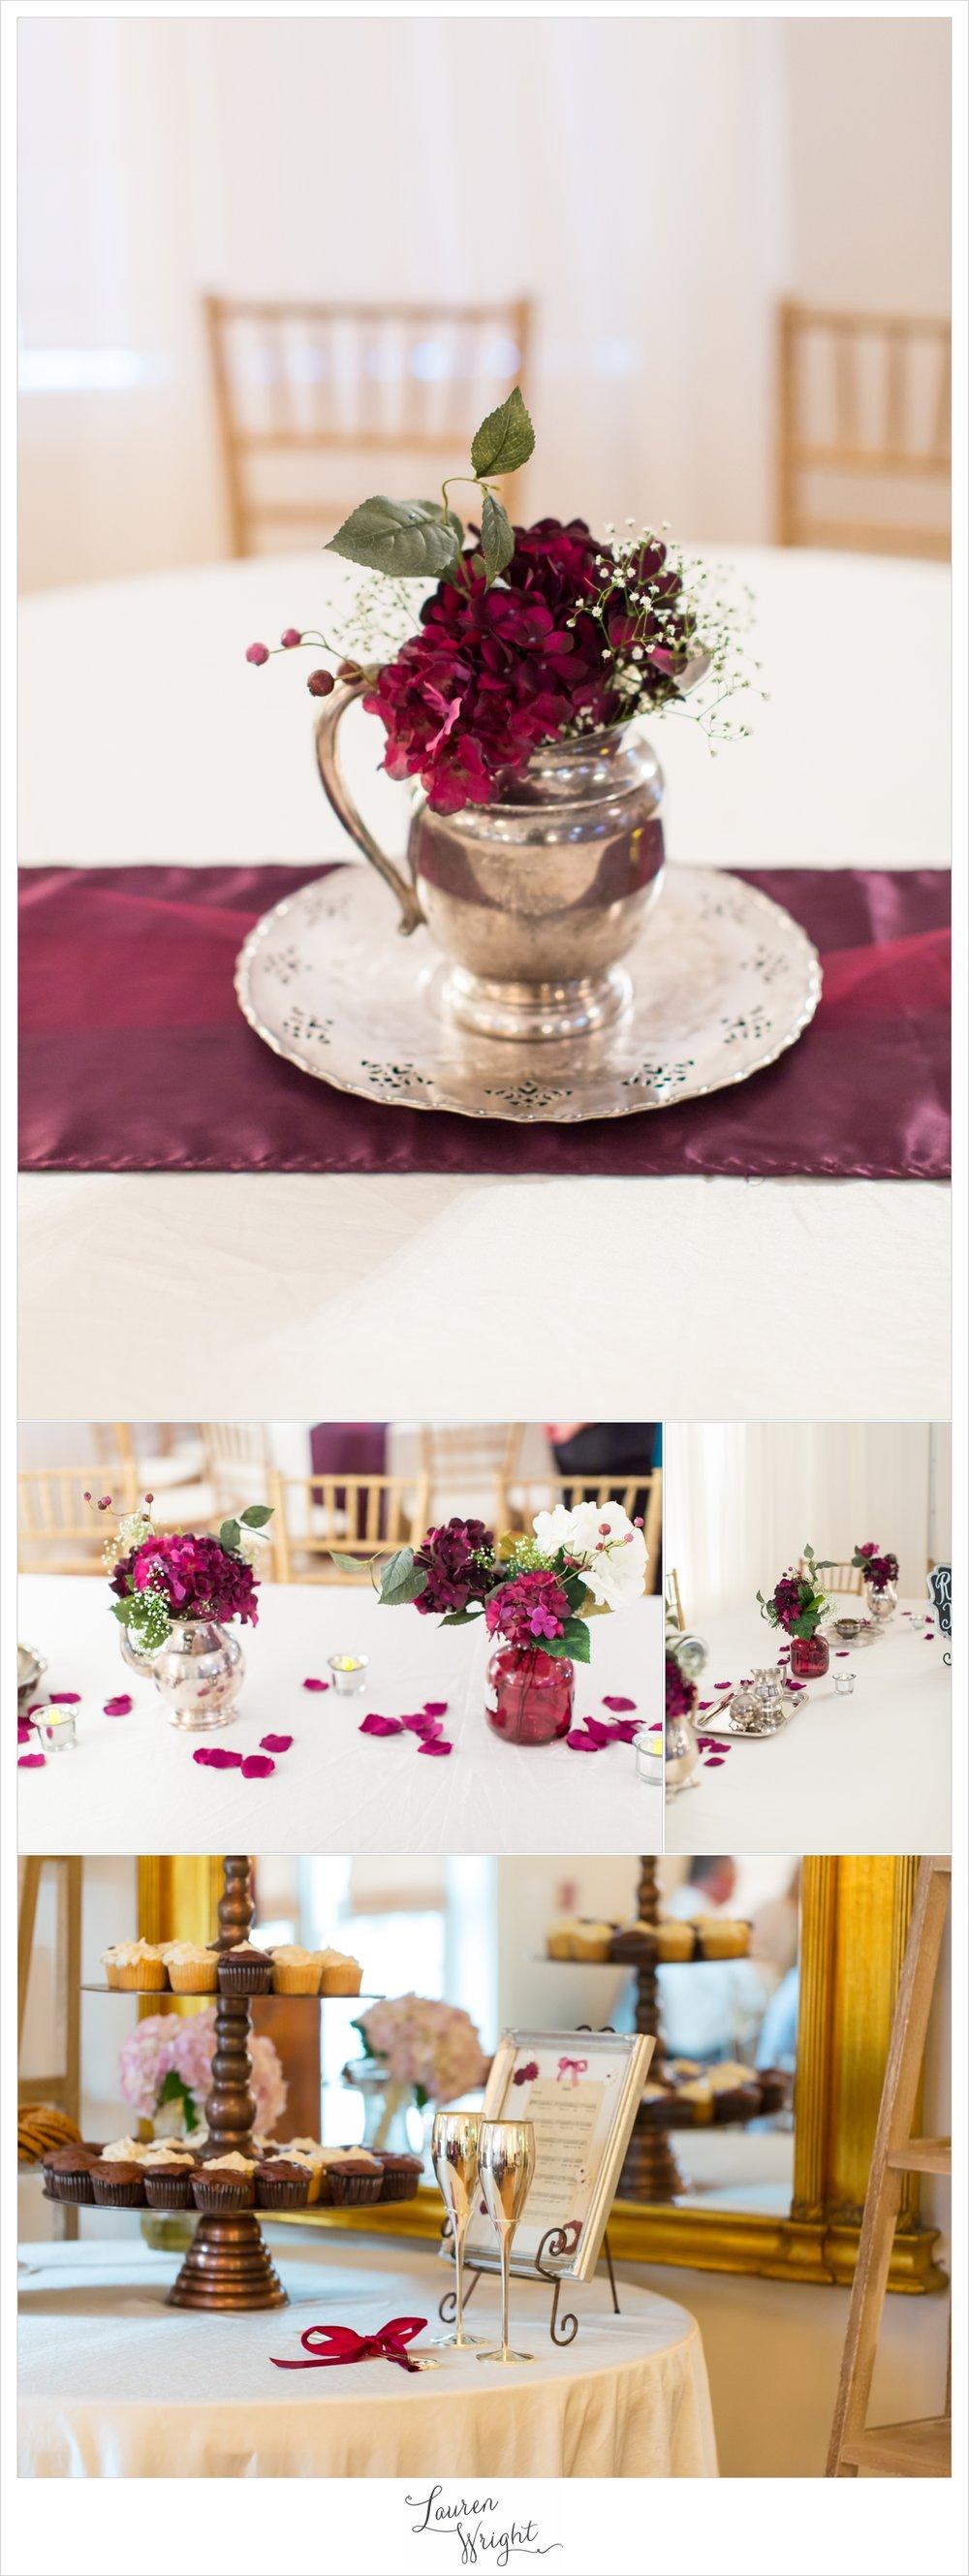 Hazelhurst-House-Wedding-Photos043